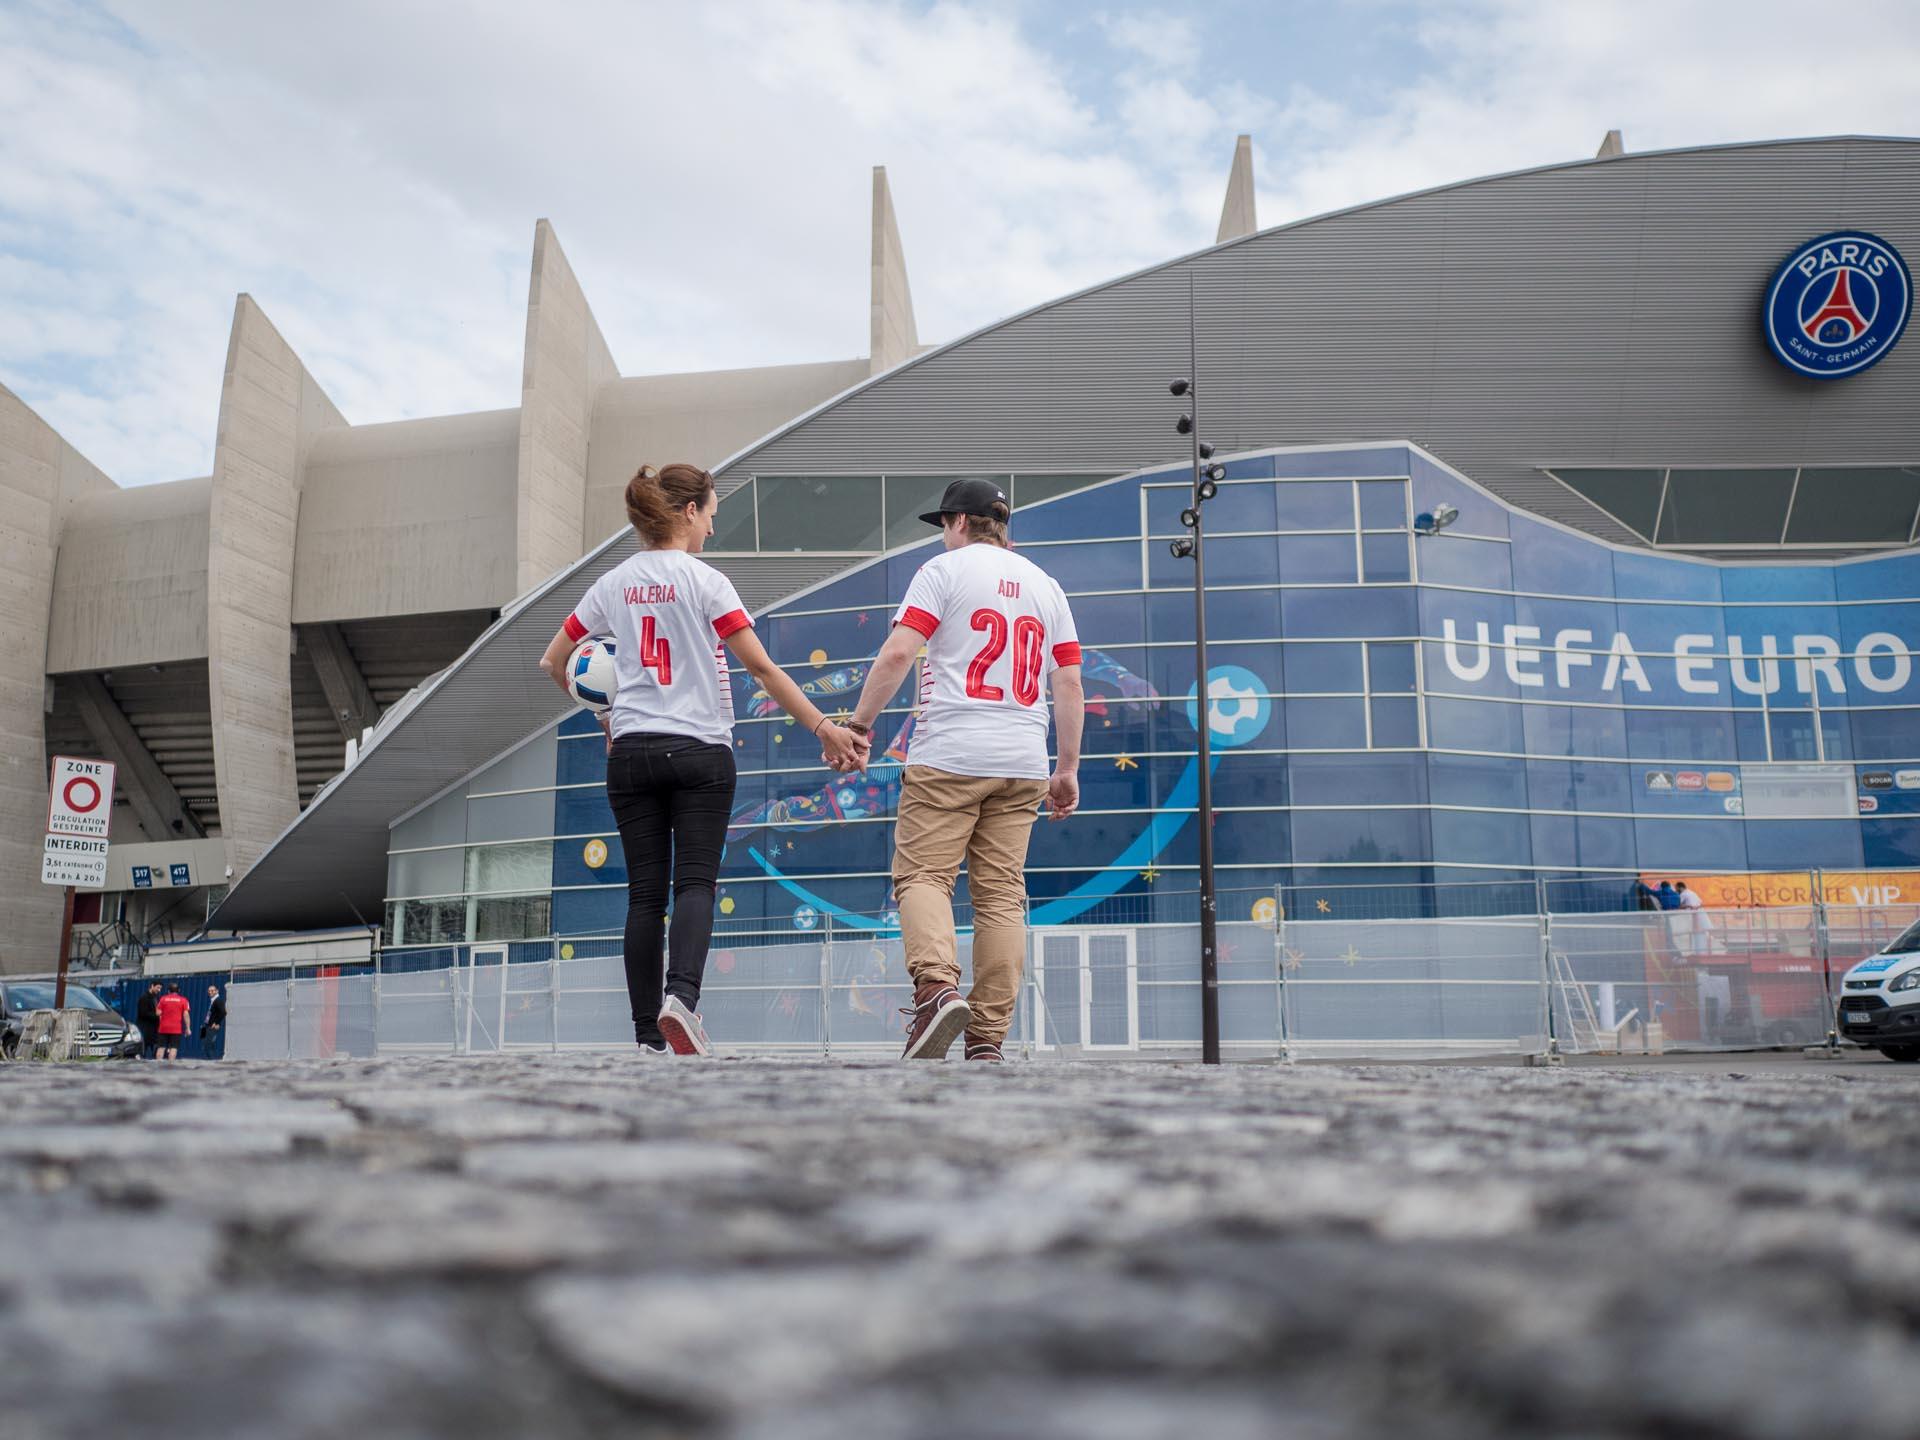 Paris Port de Princes Stadion UEFA EURO 2016-8